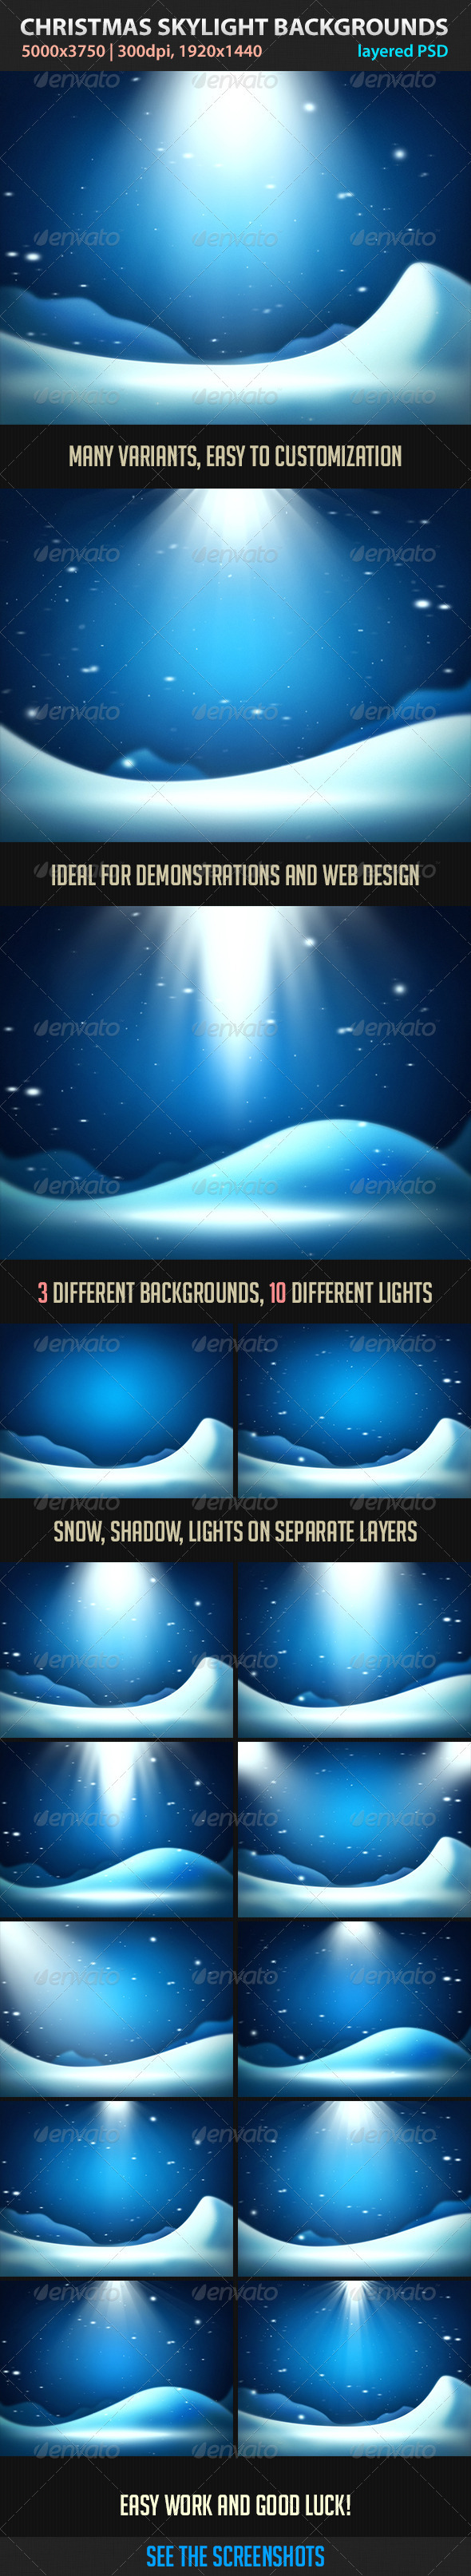 Christmas Skylight Backgrounds